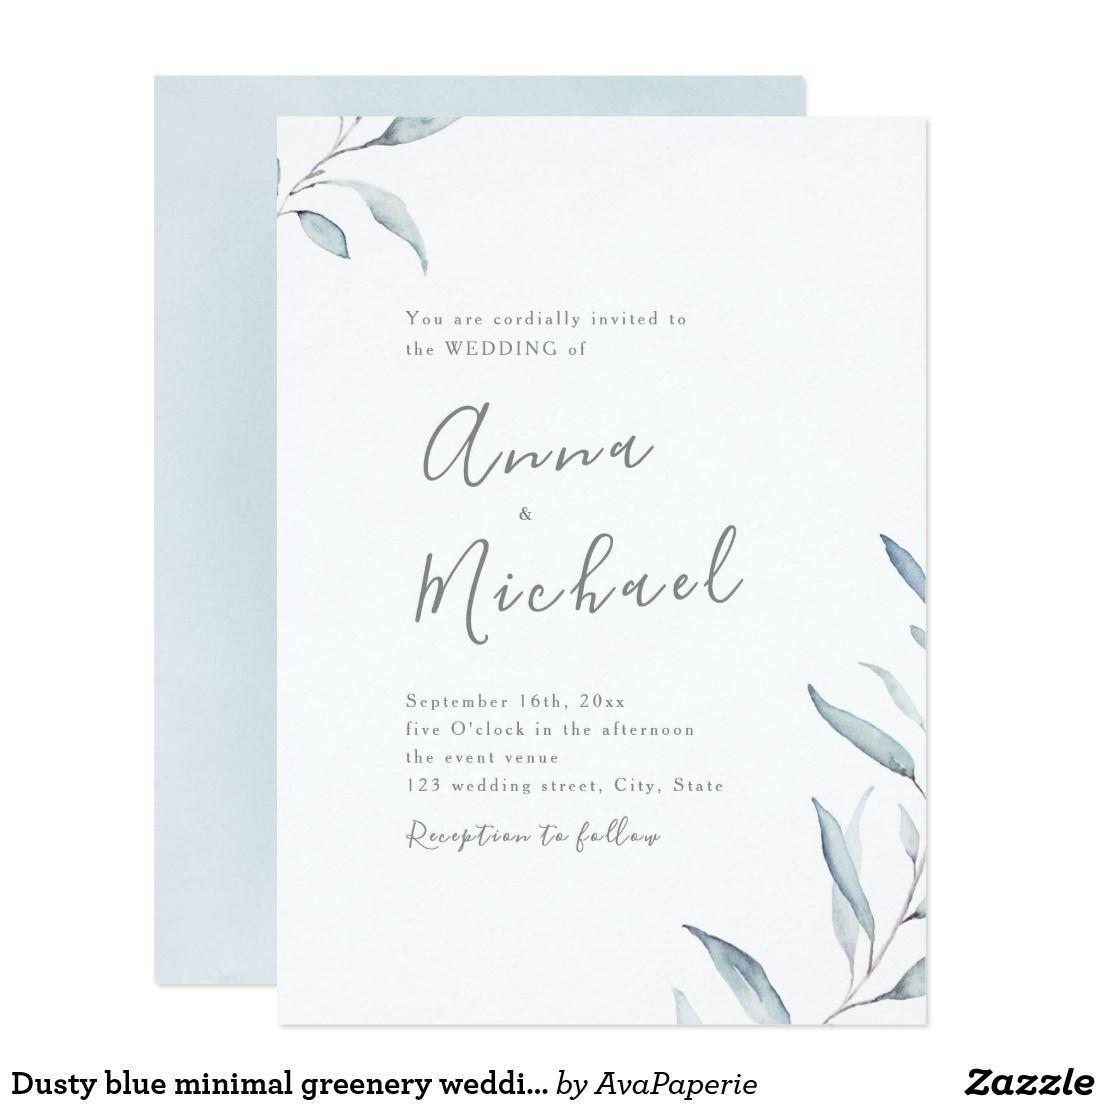 Dusty Blue Minimal Greenery Wedding Invitation Zazzle Com In 2020 Fun Wedding Invitations Minimalist Wedding Invitations Simple Wedding Invitations